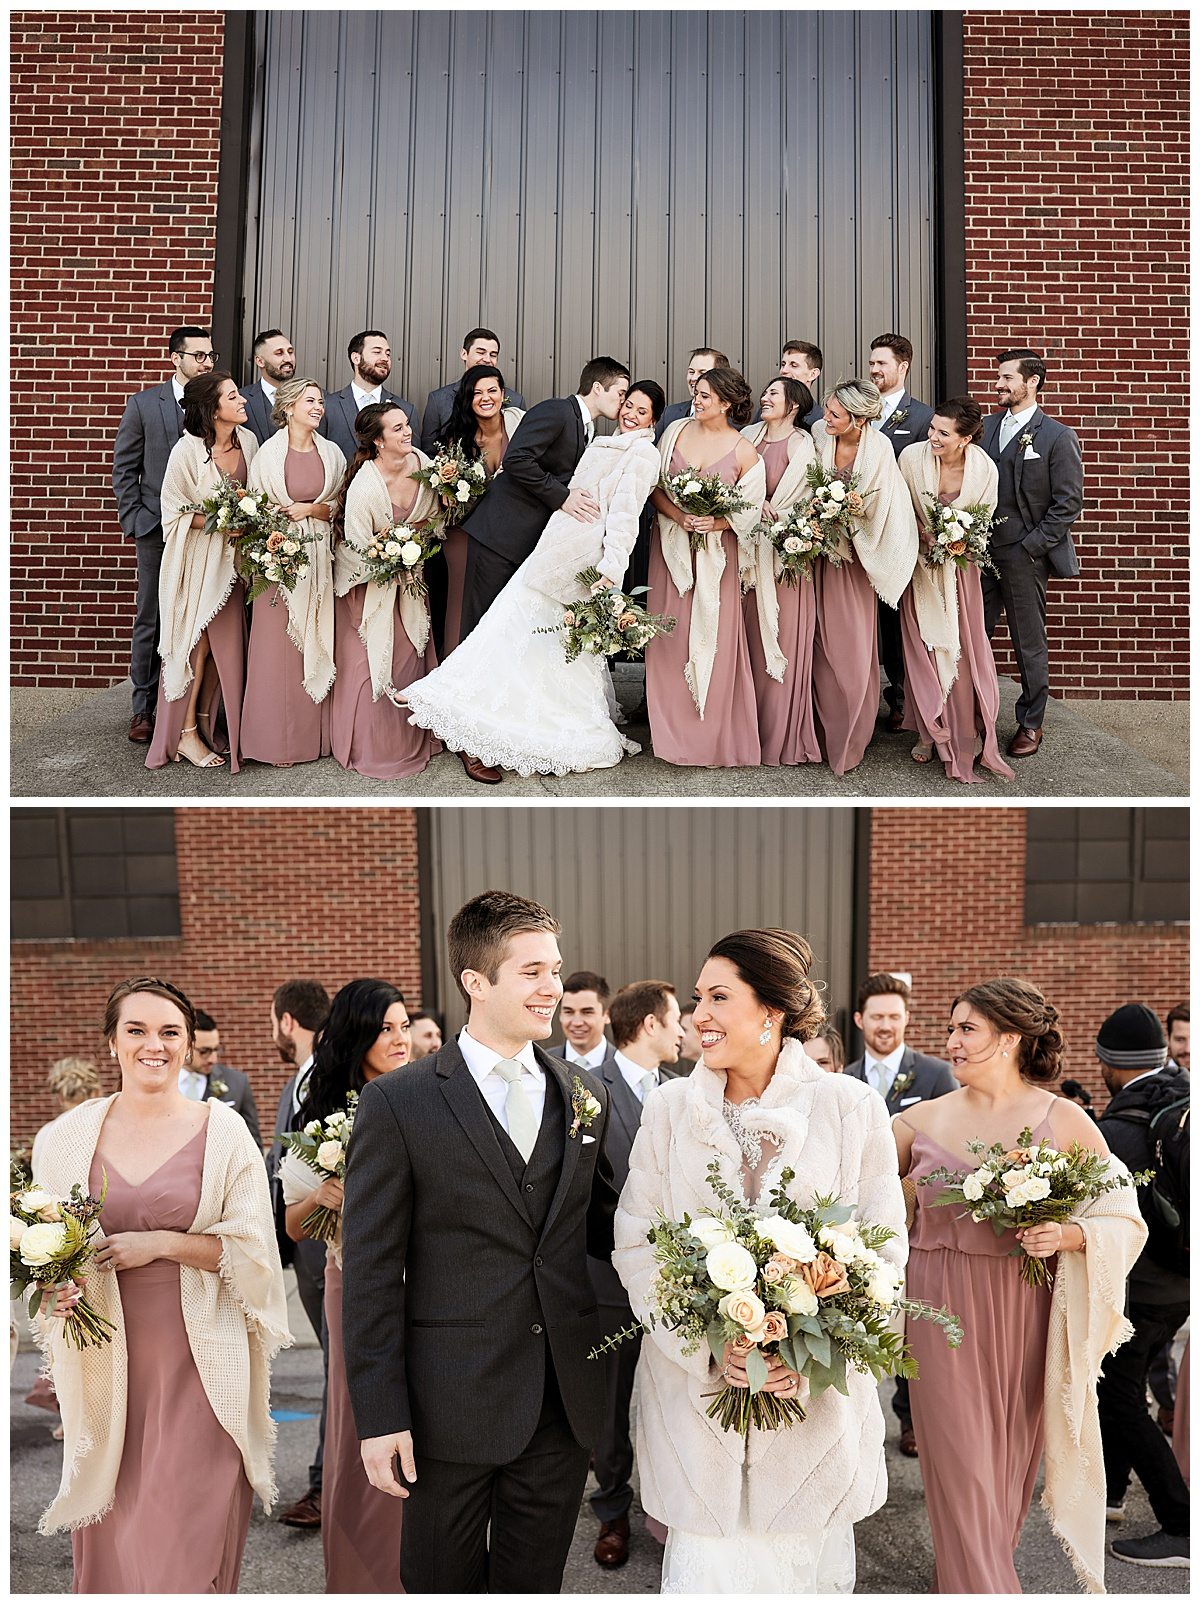 INDUSTRY_Indianapolis_Meghan Harrison Wedding Photography_0024.jpg